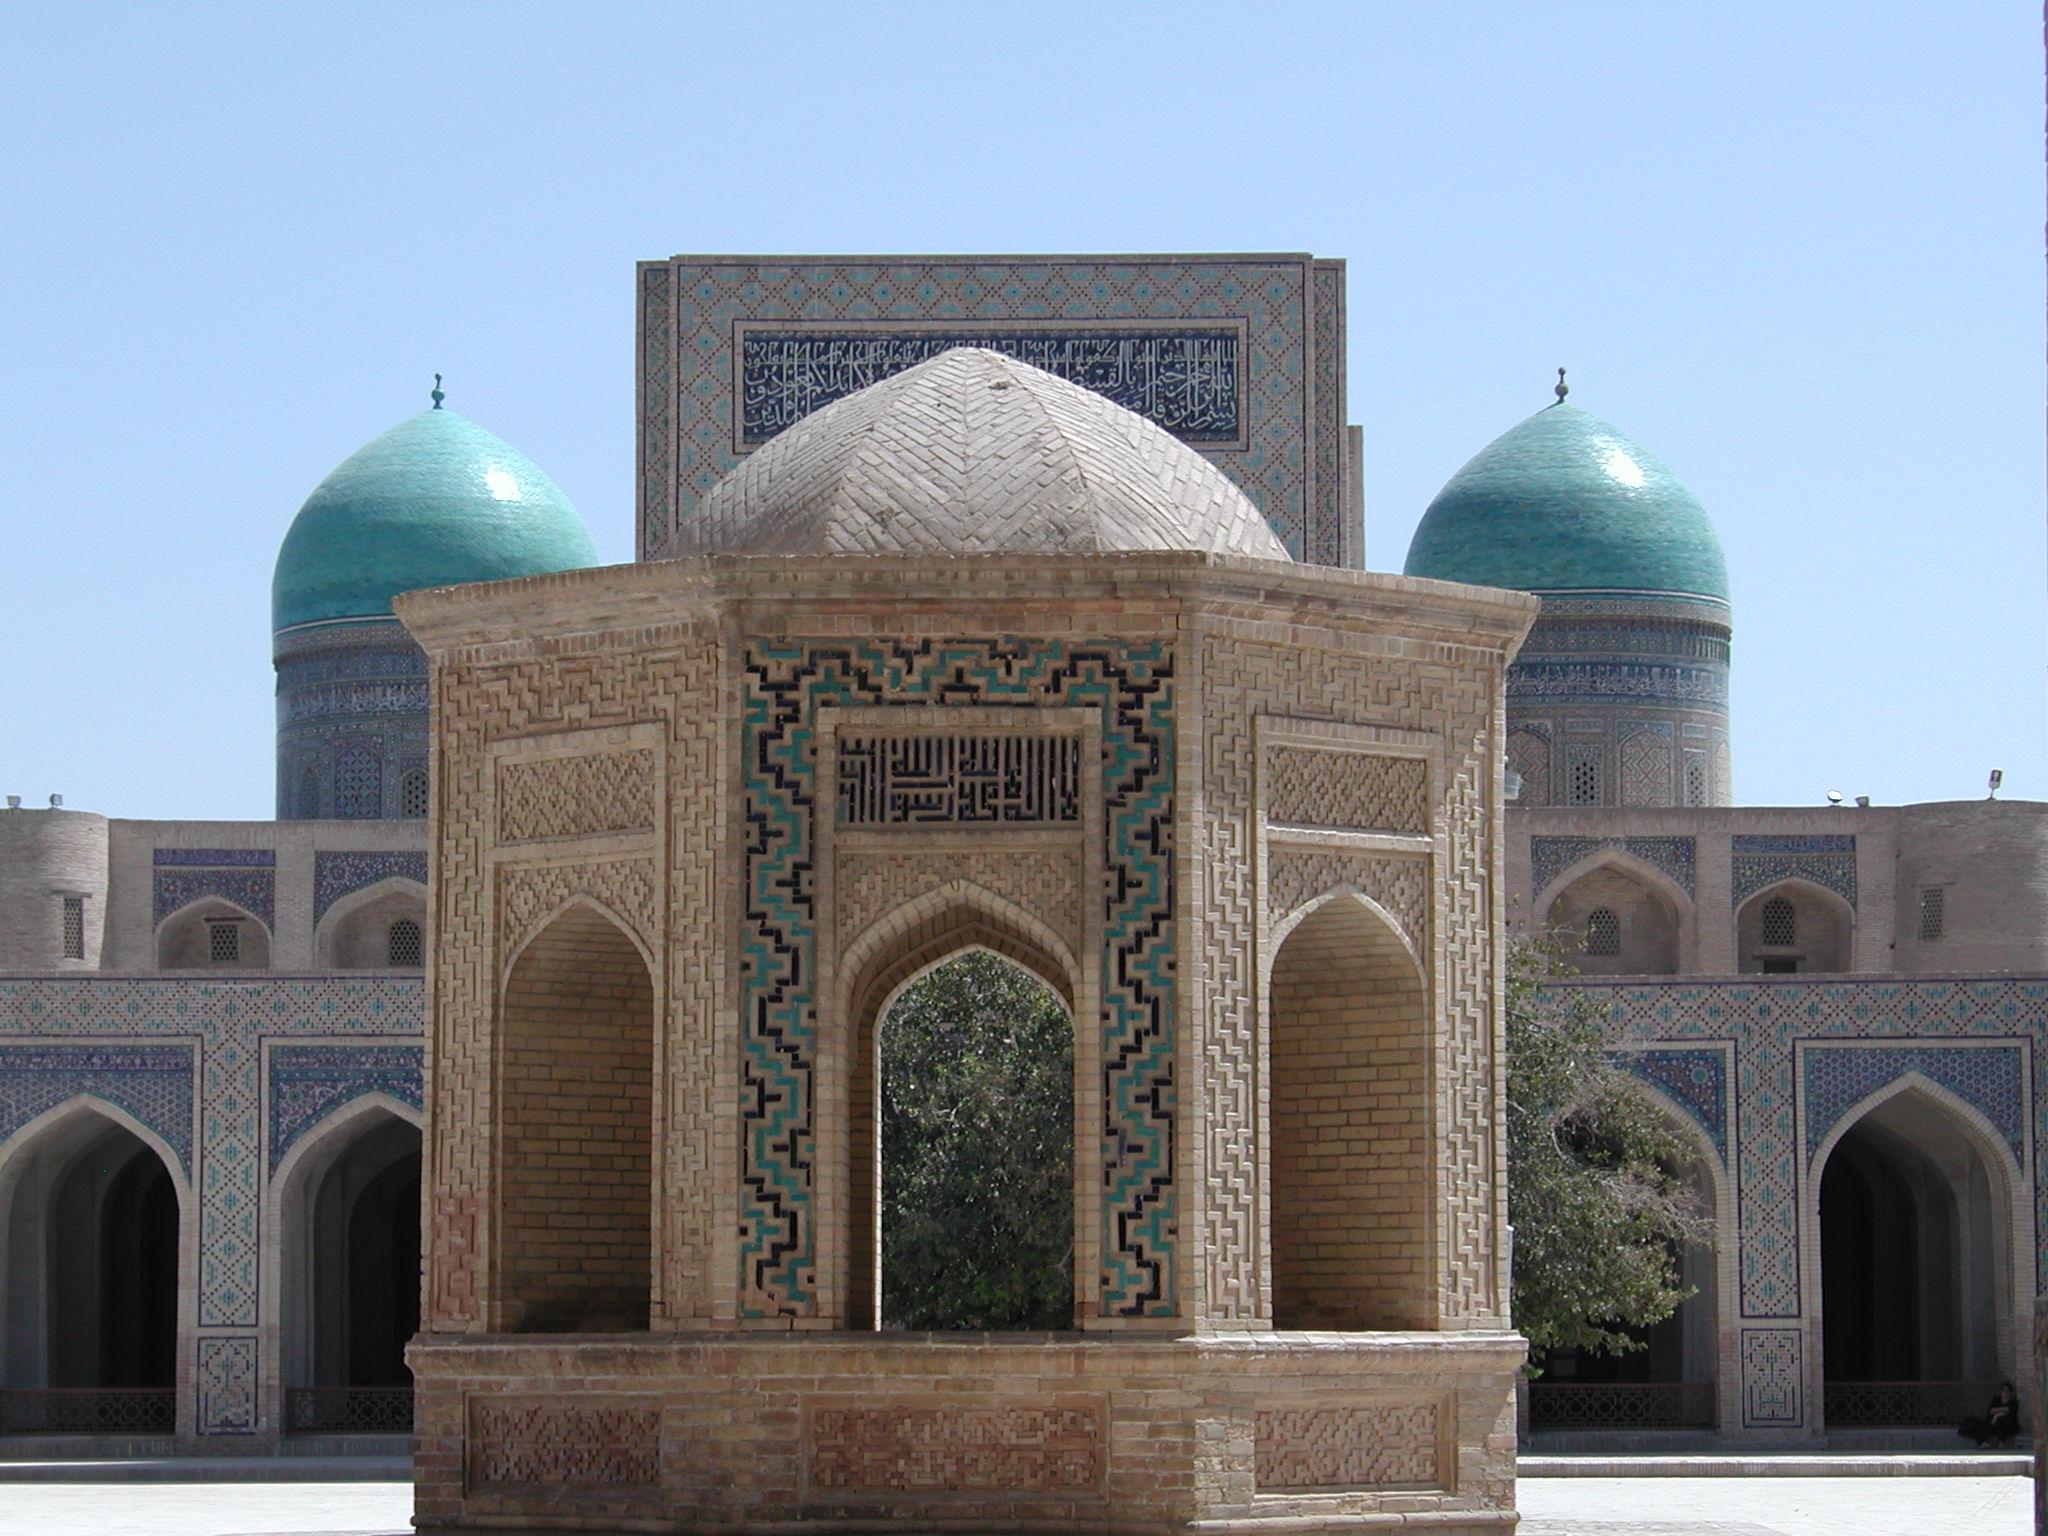 Filepo I Kalan Mosque 2 Jpg